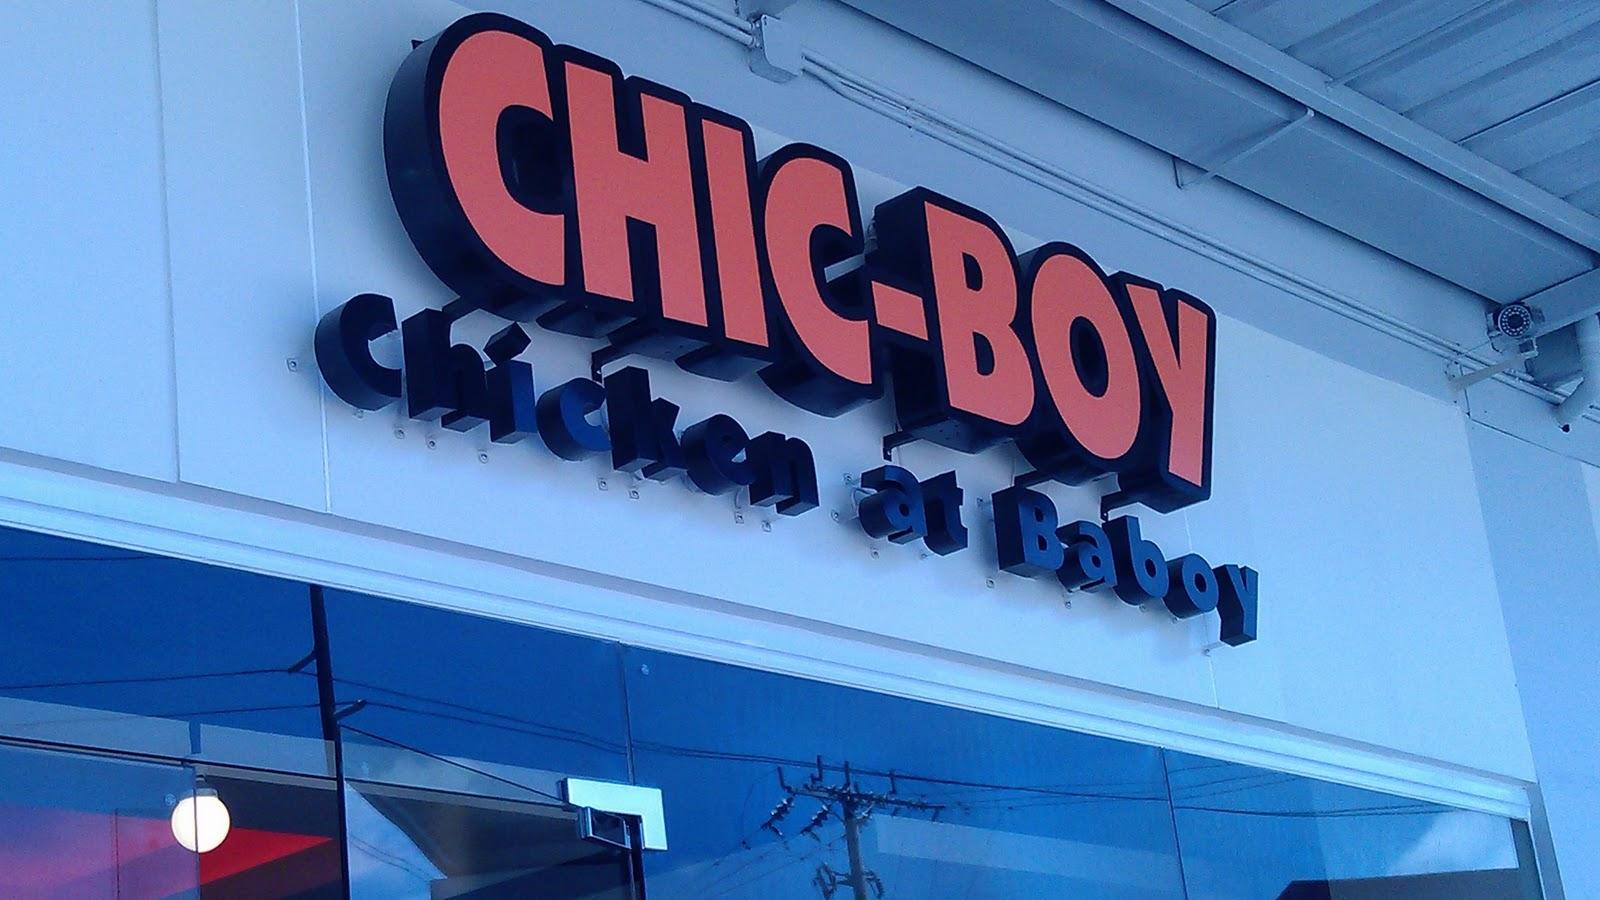 Chic Boy Restaurant In Central Mall Noelizm